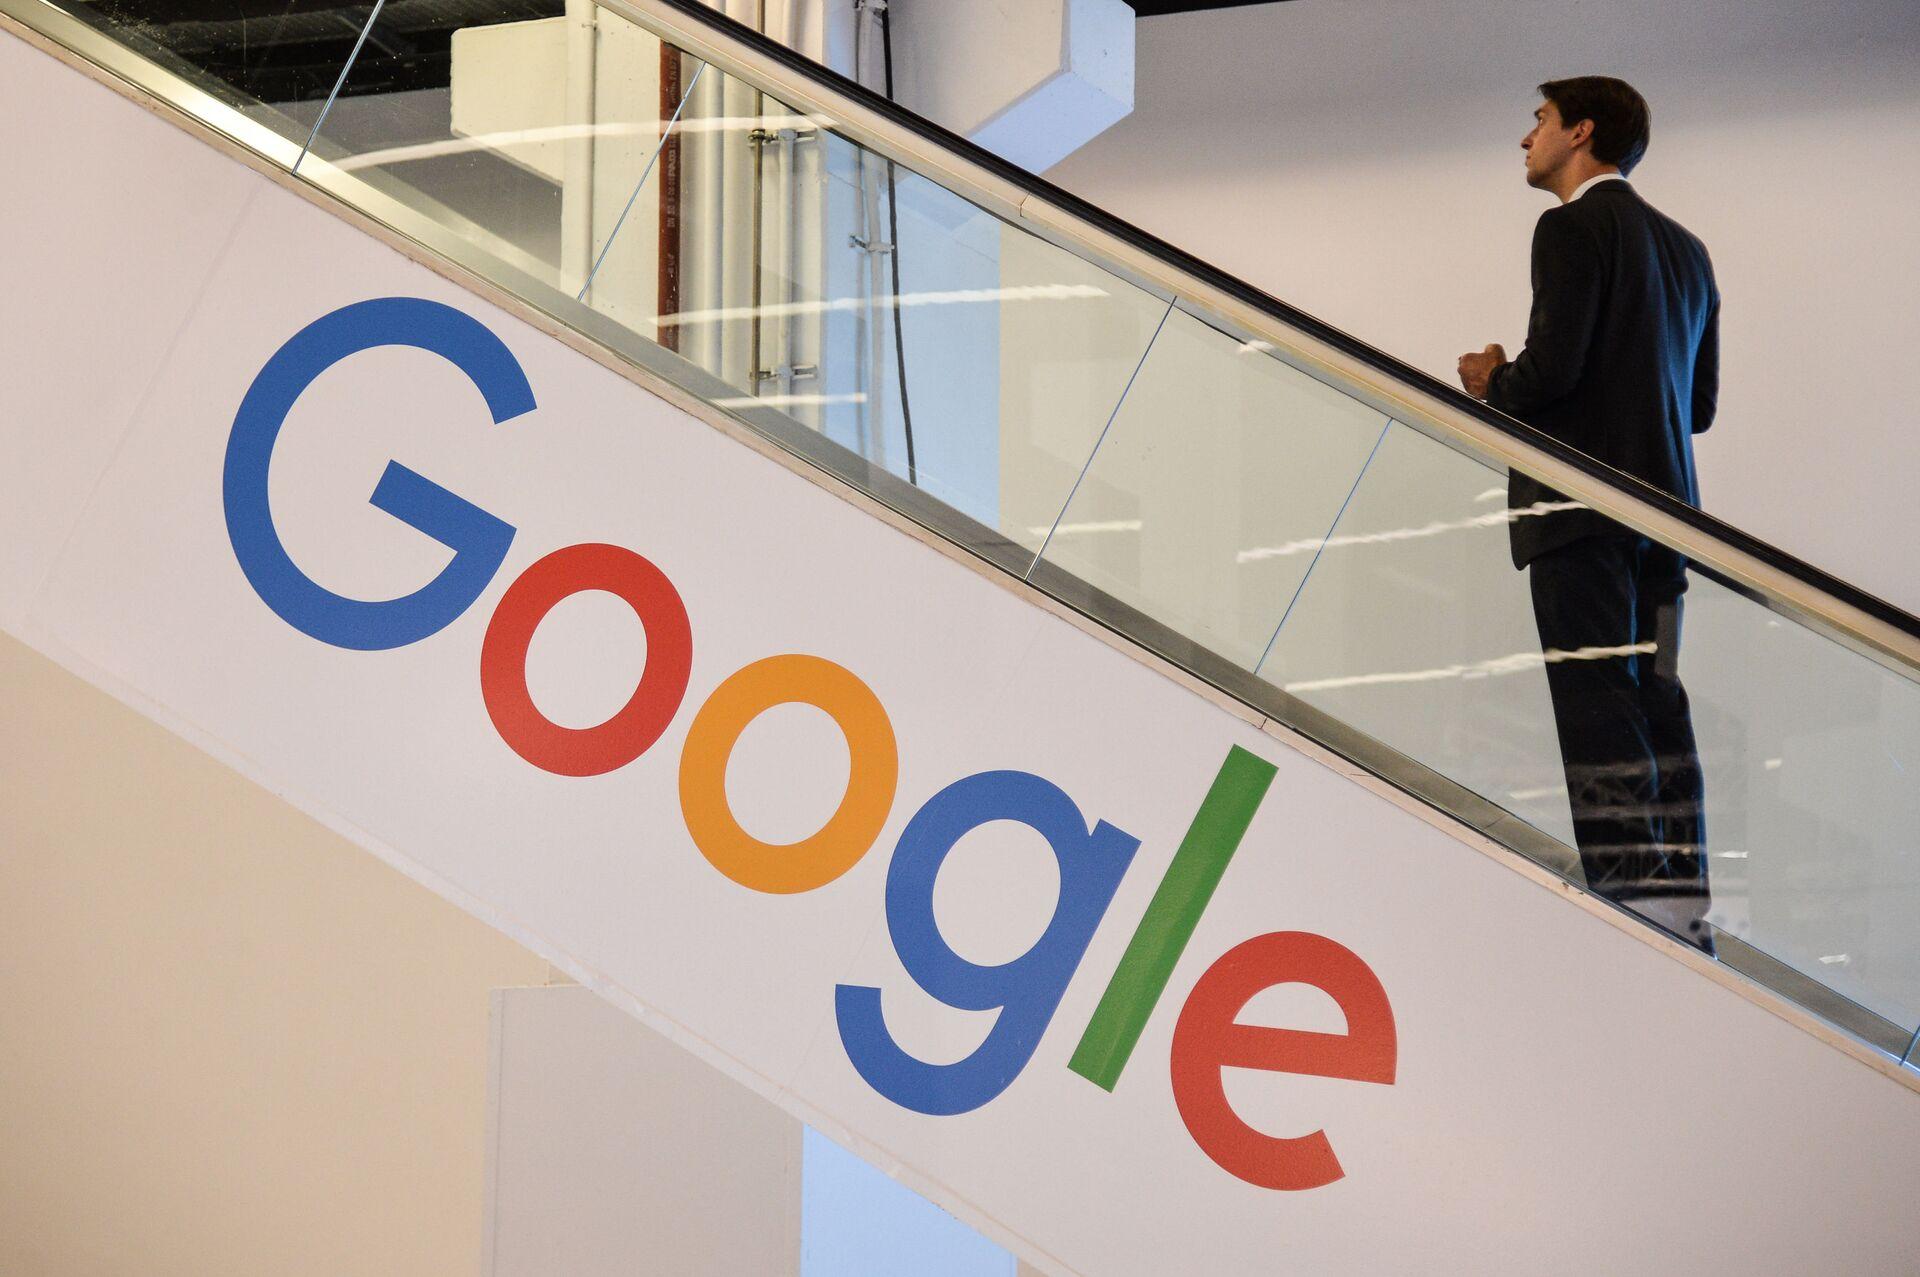 Мужчина на фоне лейбла компании Google - Sputnik Тоҷикистон, 1920, 14.09.2021